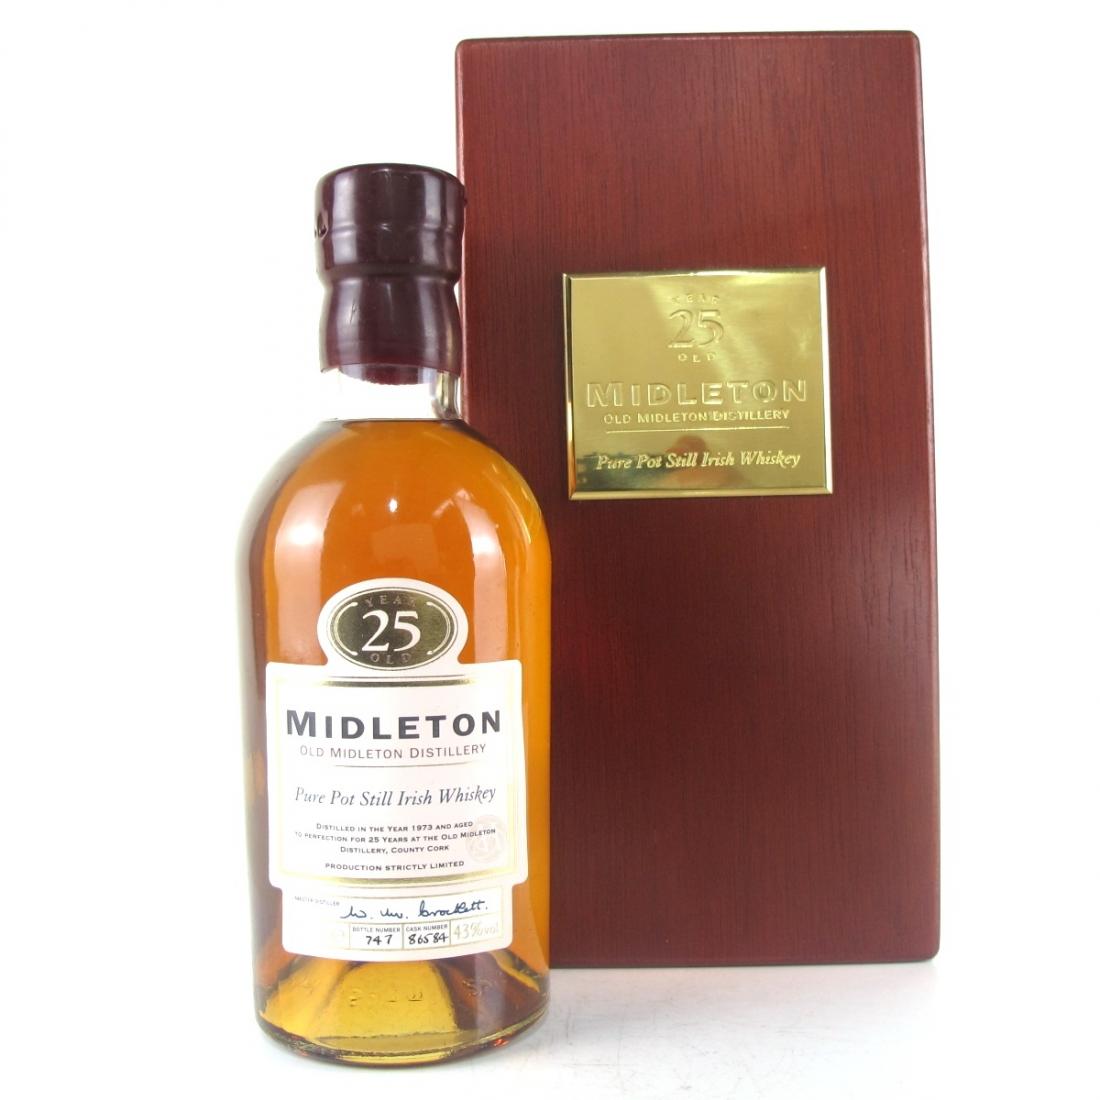 Midleton 1973 Master Distiller's 25 Year Old